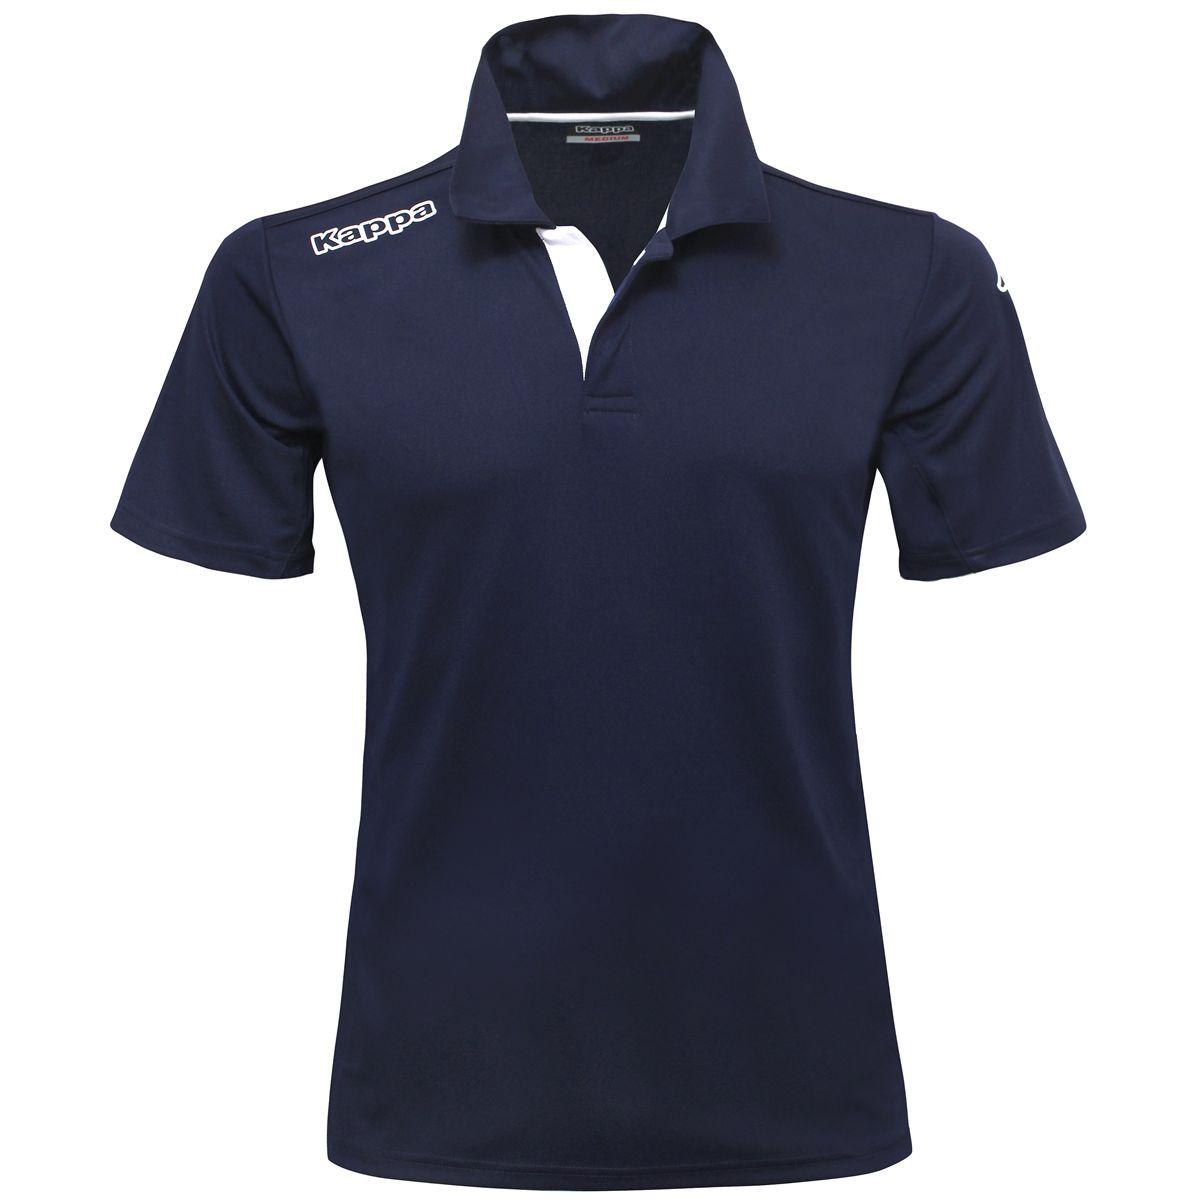 Kappa-T-shirt-sportiva-Uomo-KAPPA4GOLF-SICET-Golf-sport-Polo miniatura 4